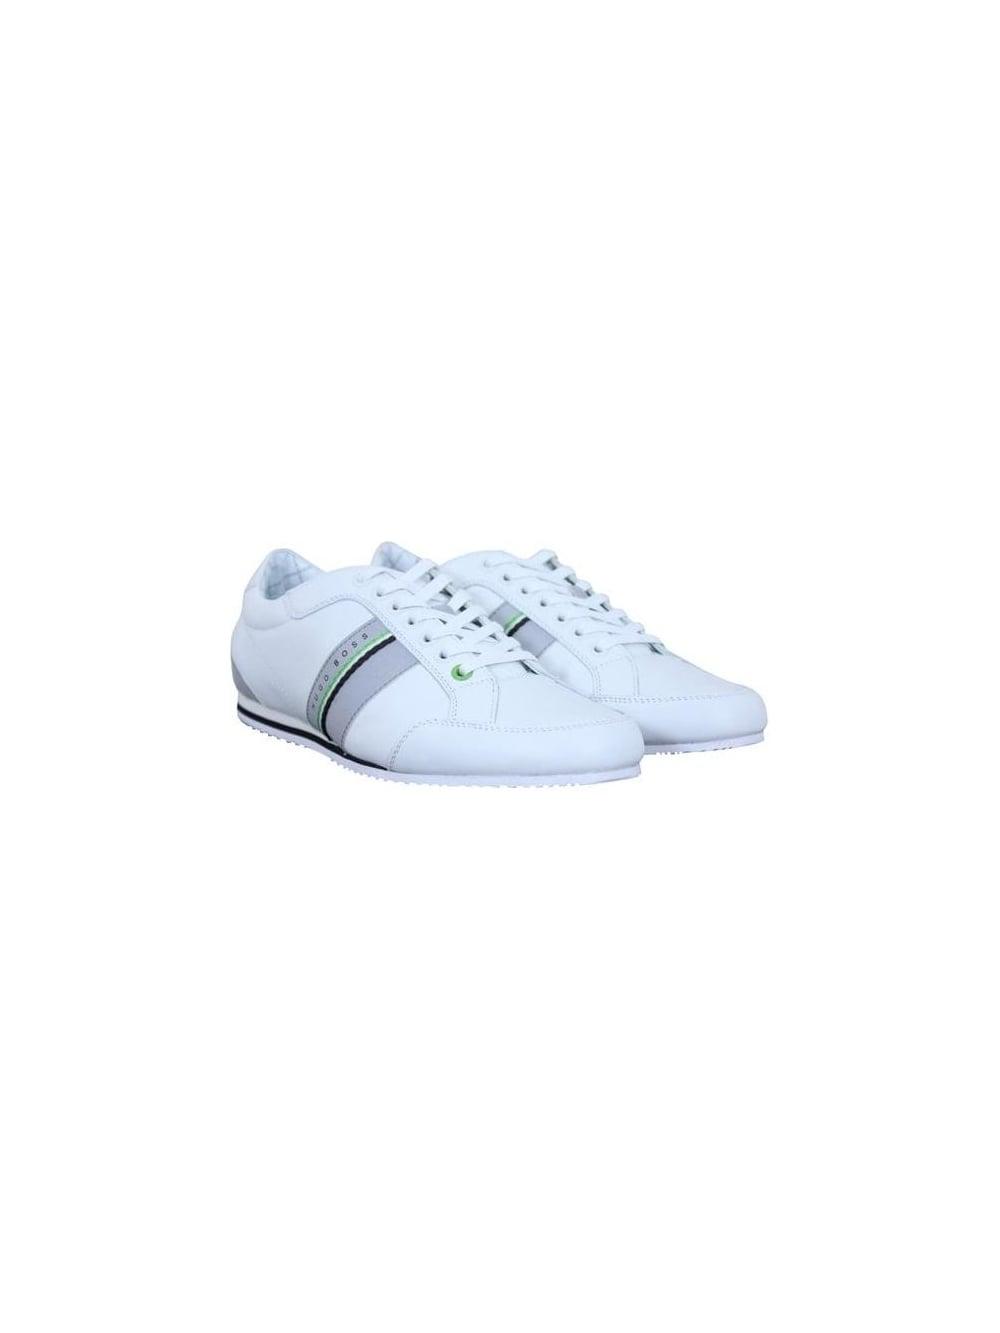 BOSS Trainers - white khu6t